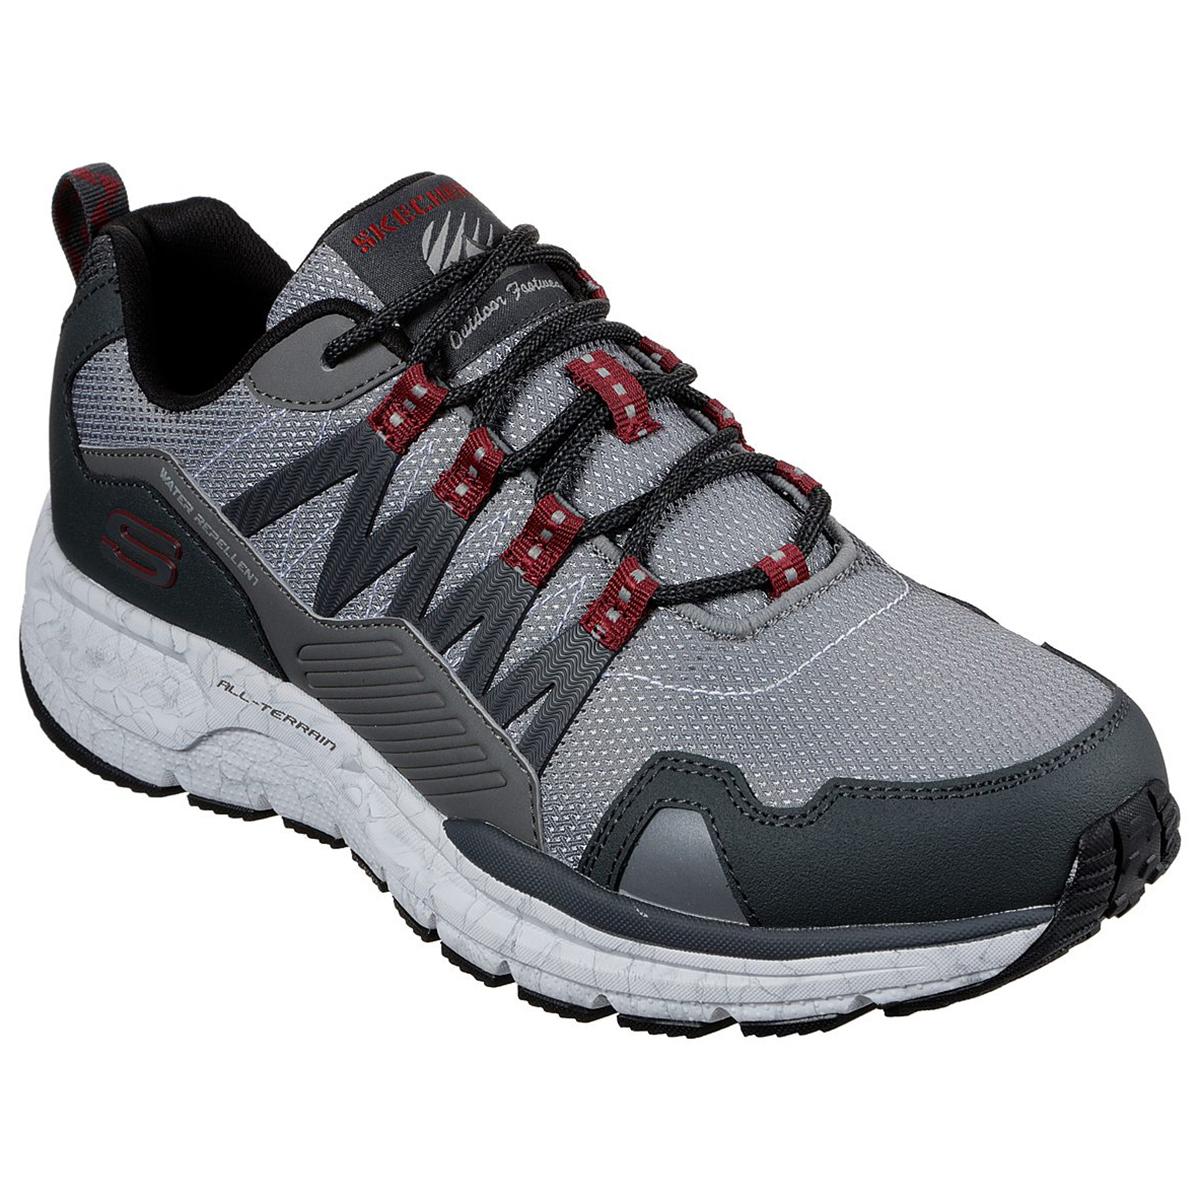 Skechers Men's Escape Plan 2.0 Ashwick Shoes - Black, 9